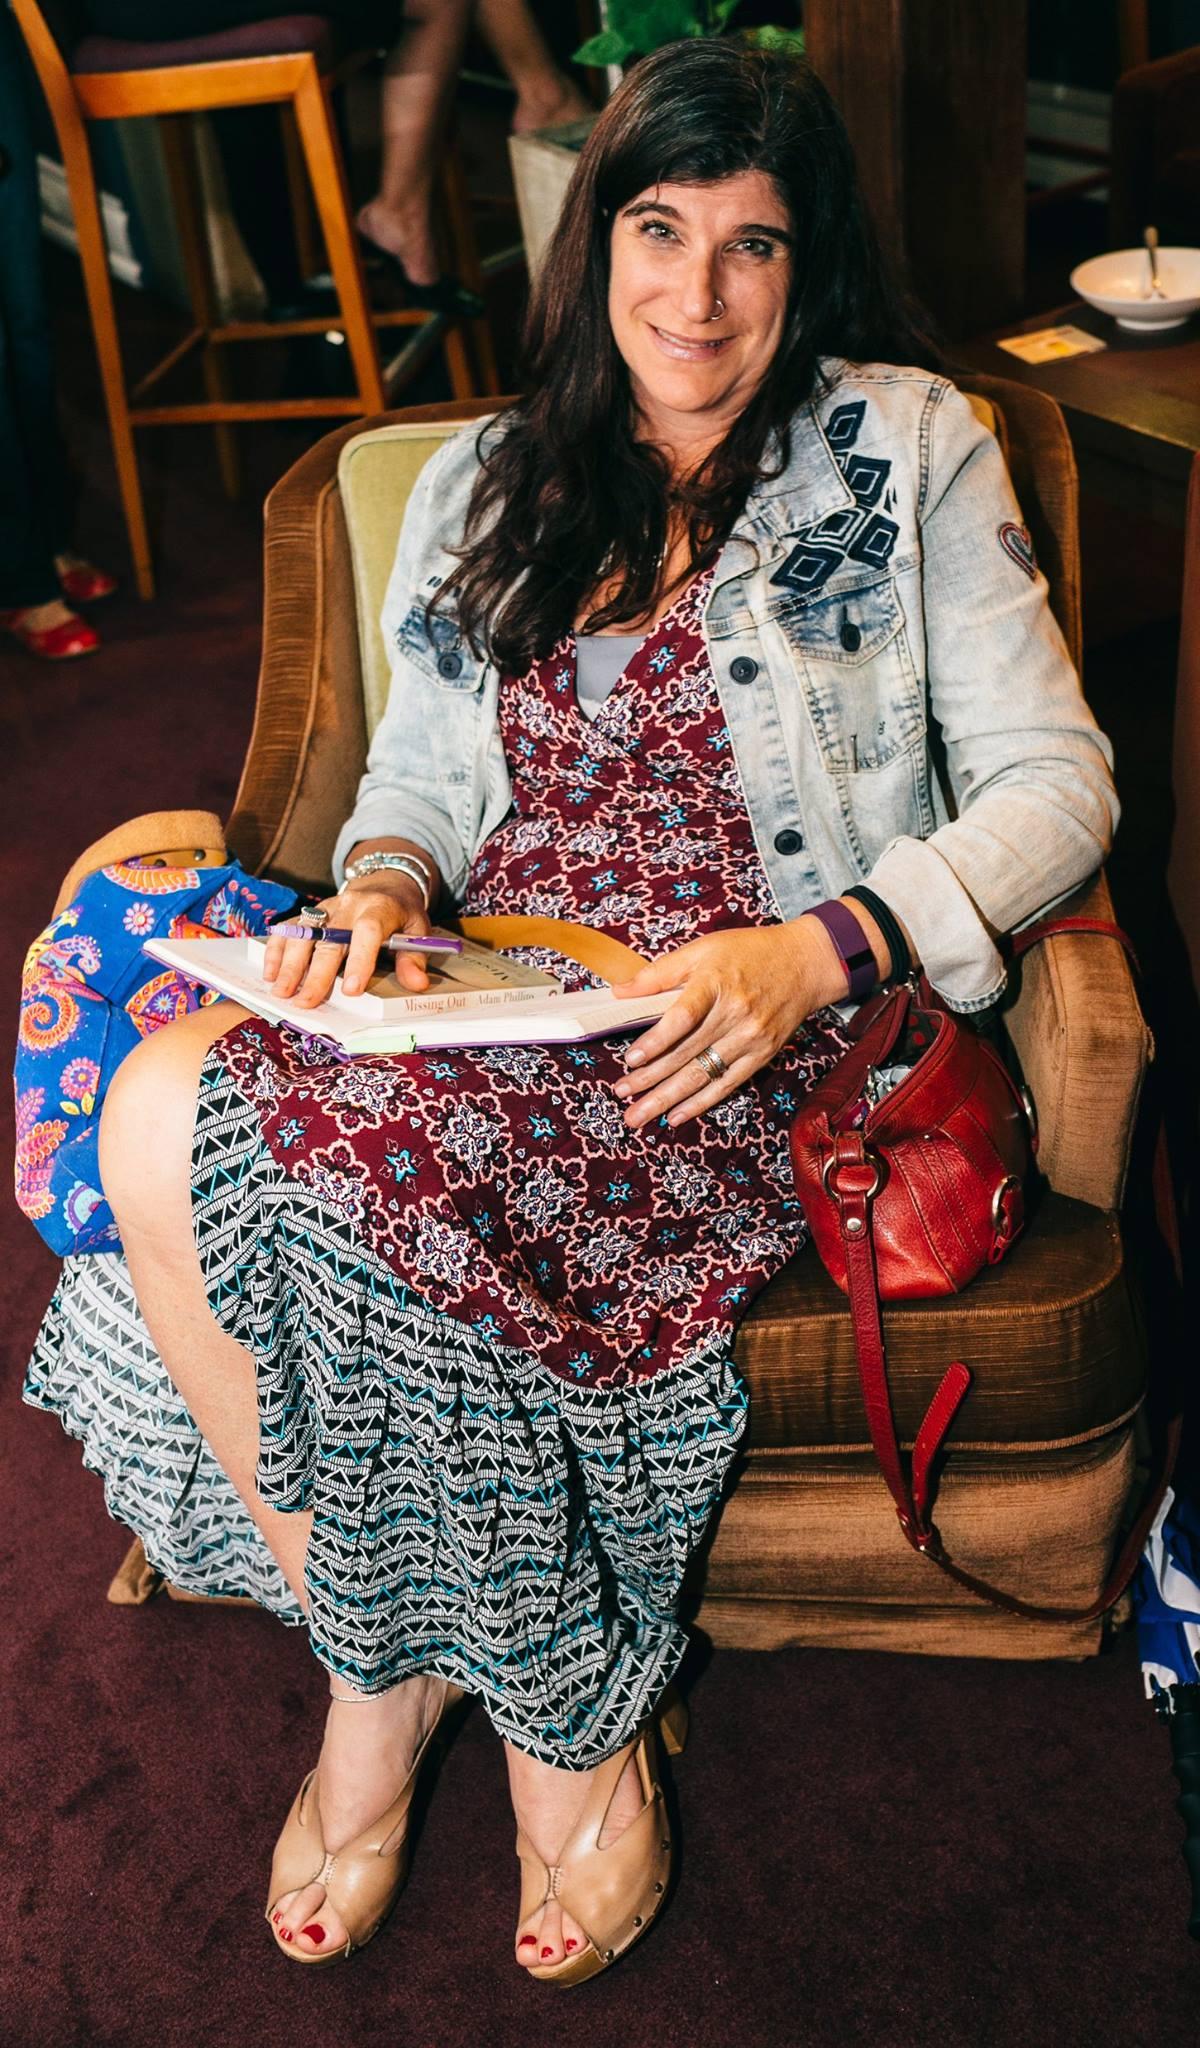 Talented creative mama, author Joanne Fedler